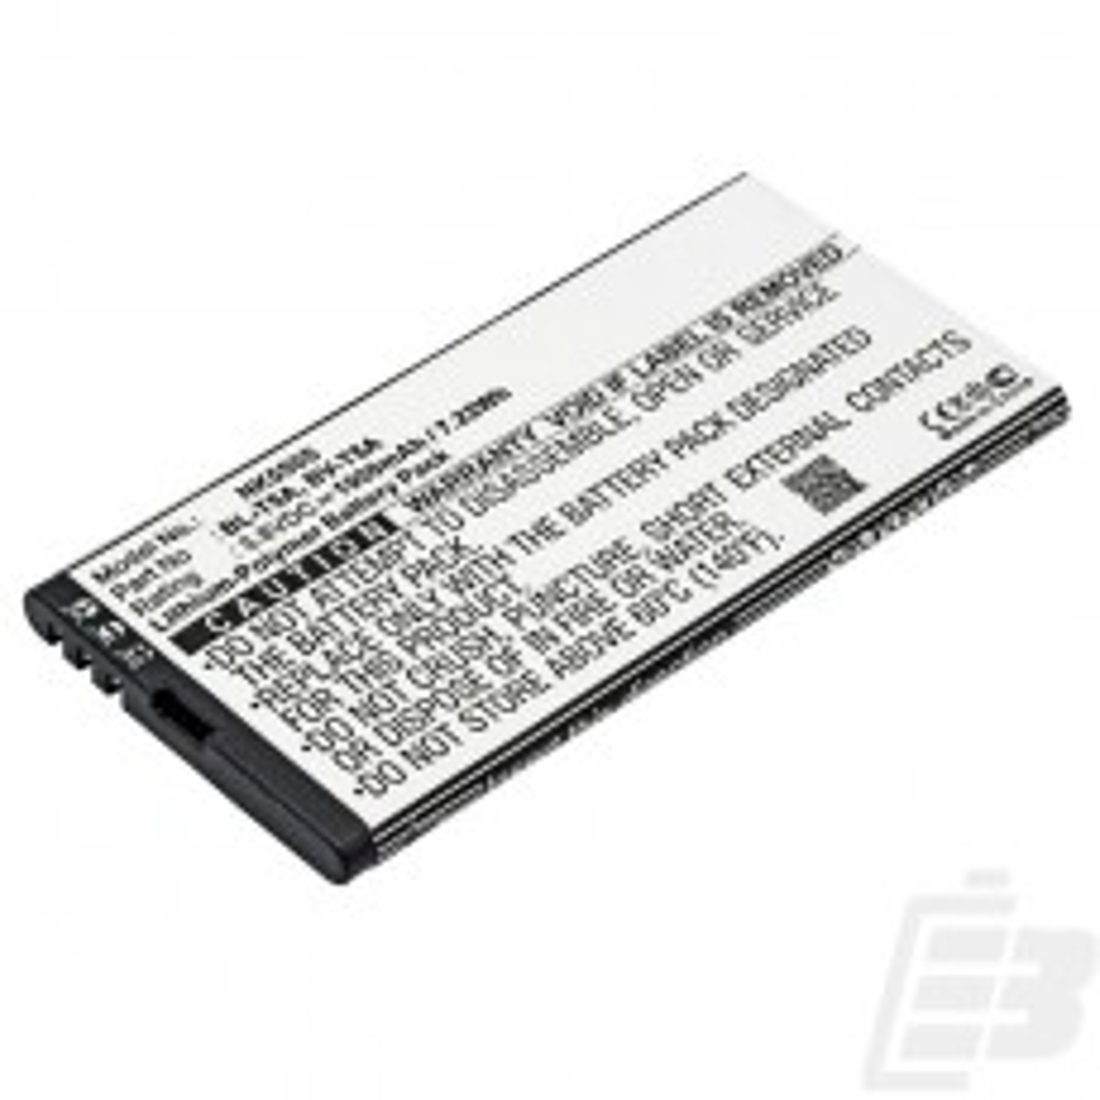 Smartphone battery Microsoft Lumia 550_1